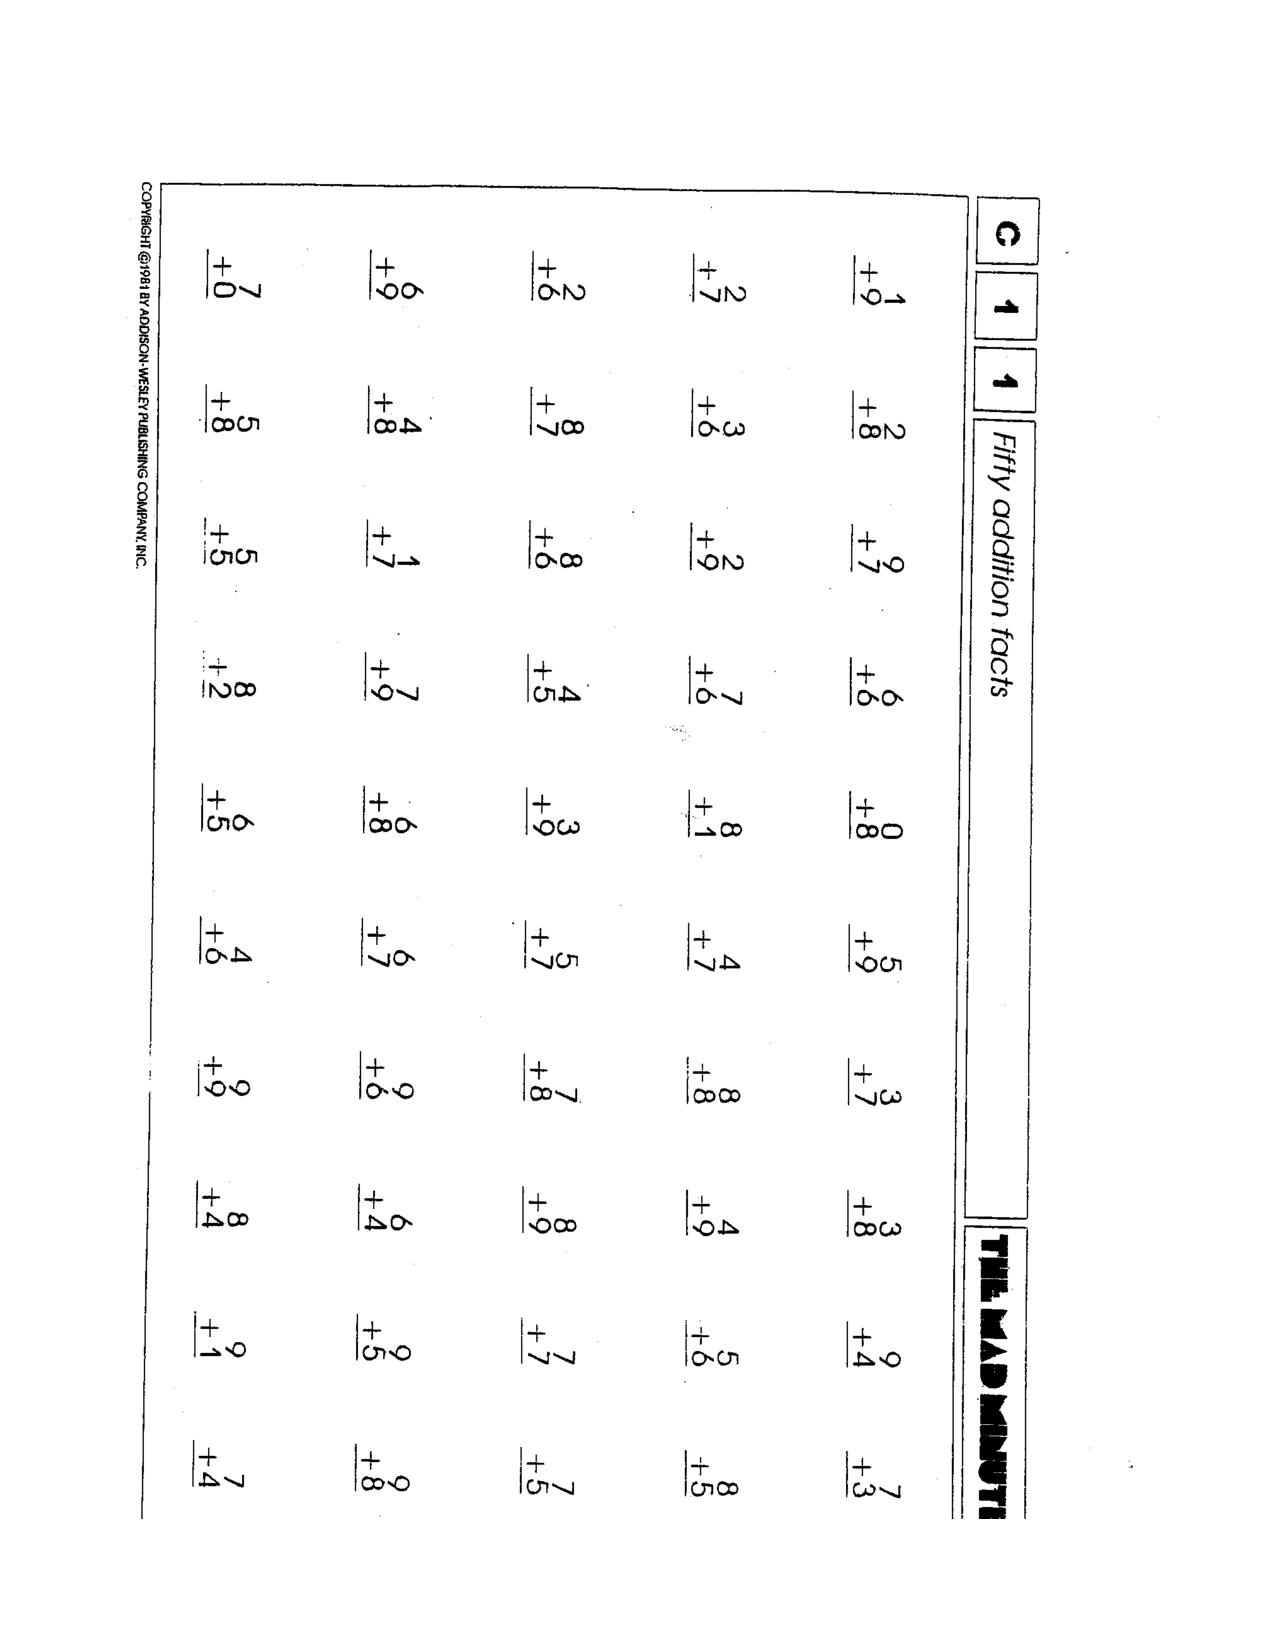 Math Worksheets For 4th Grade Fourth Grade Math Worksheets Doc